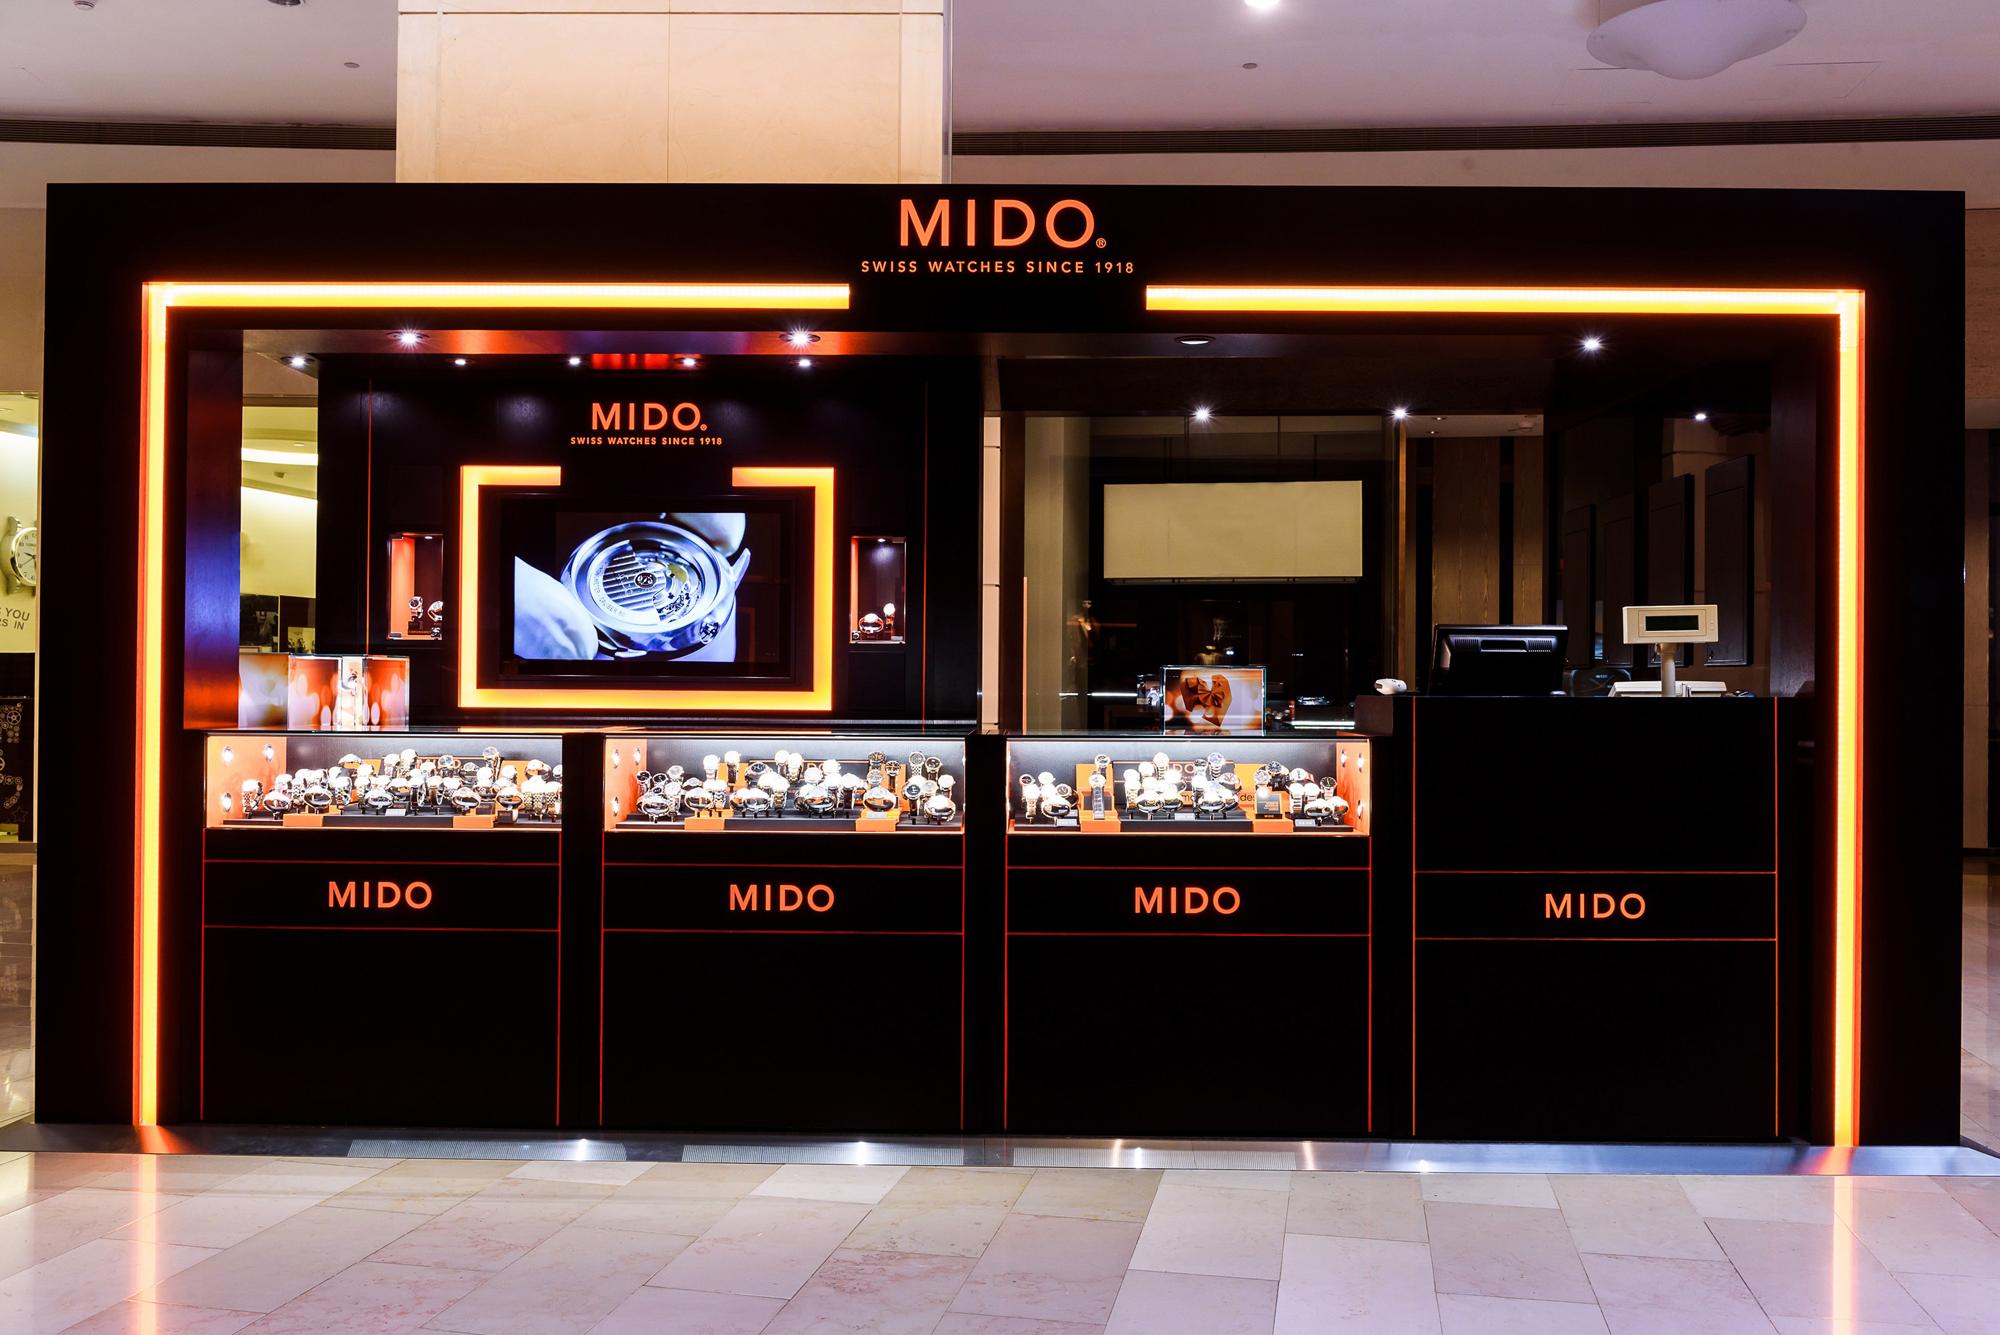 MIDO美度表台北101專賣店由瑞士原廠設計師親自操刀,以品牌經典的橘黑色系為主軸。